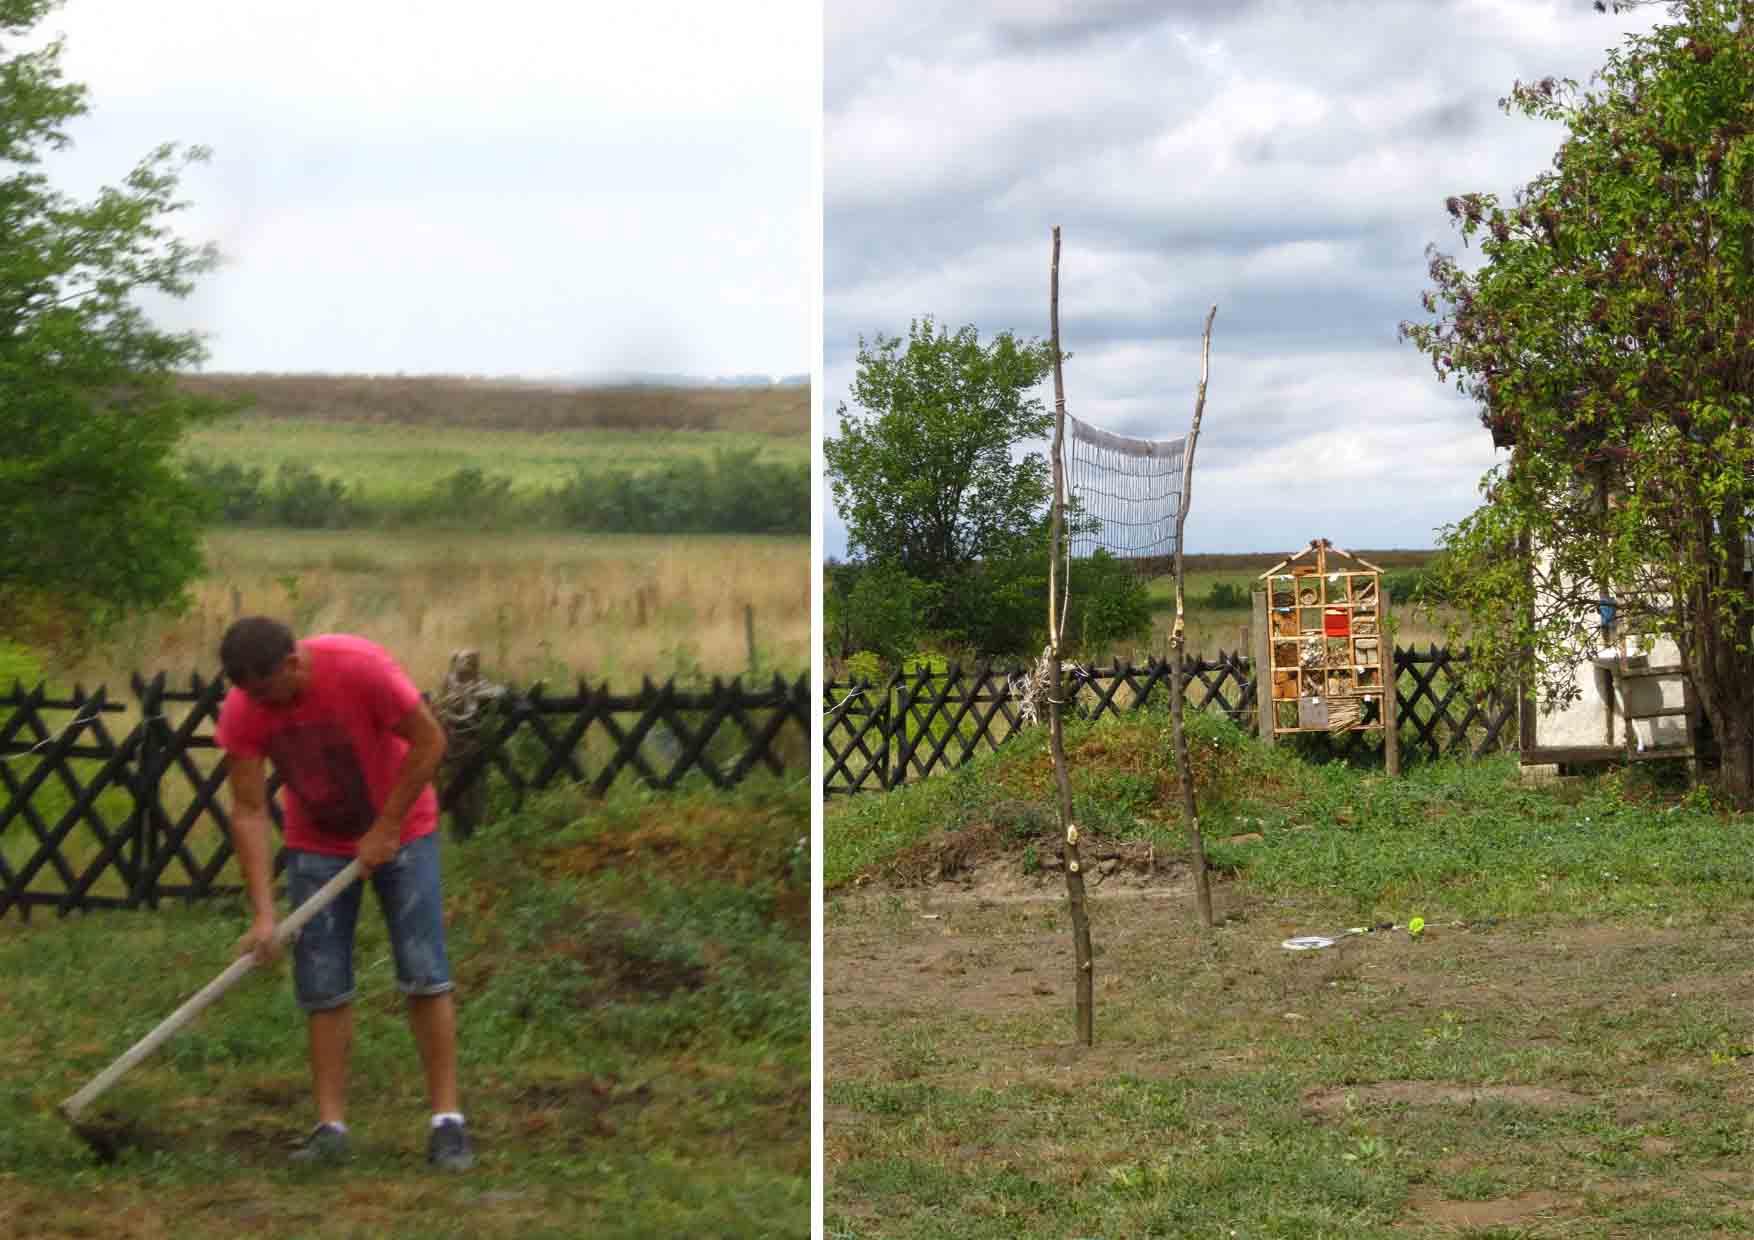 10a kamp zemljane gradnje II Djole sprema teren za odbojku i badminton